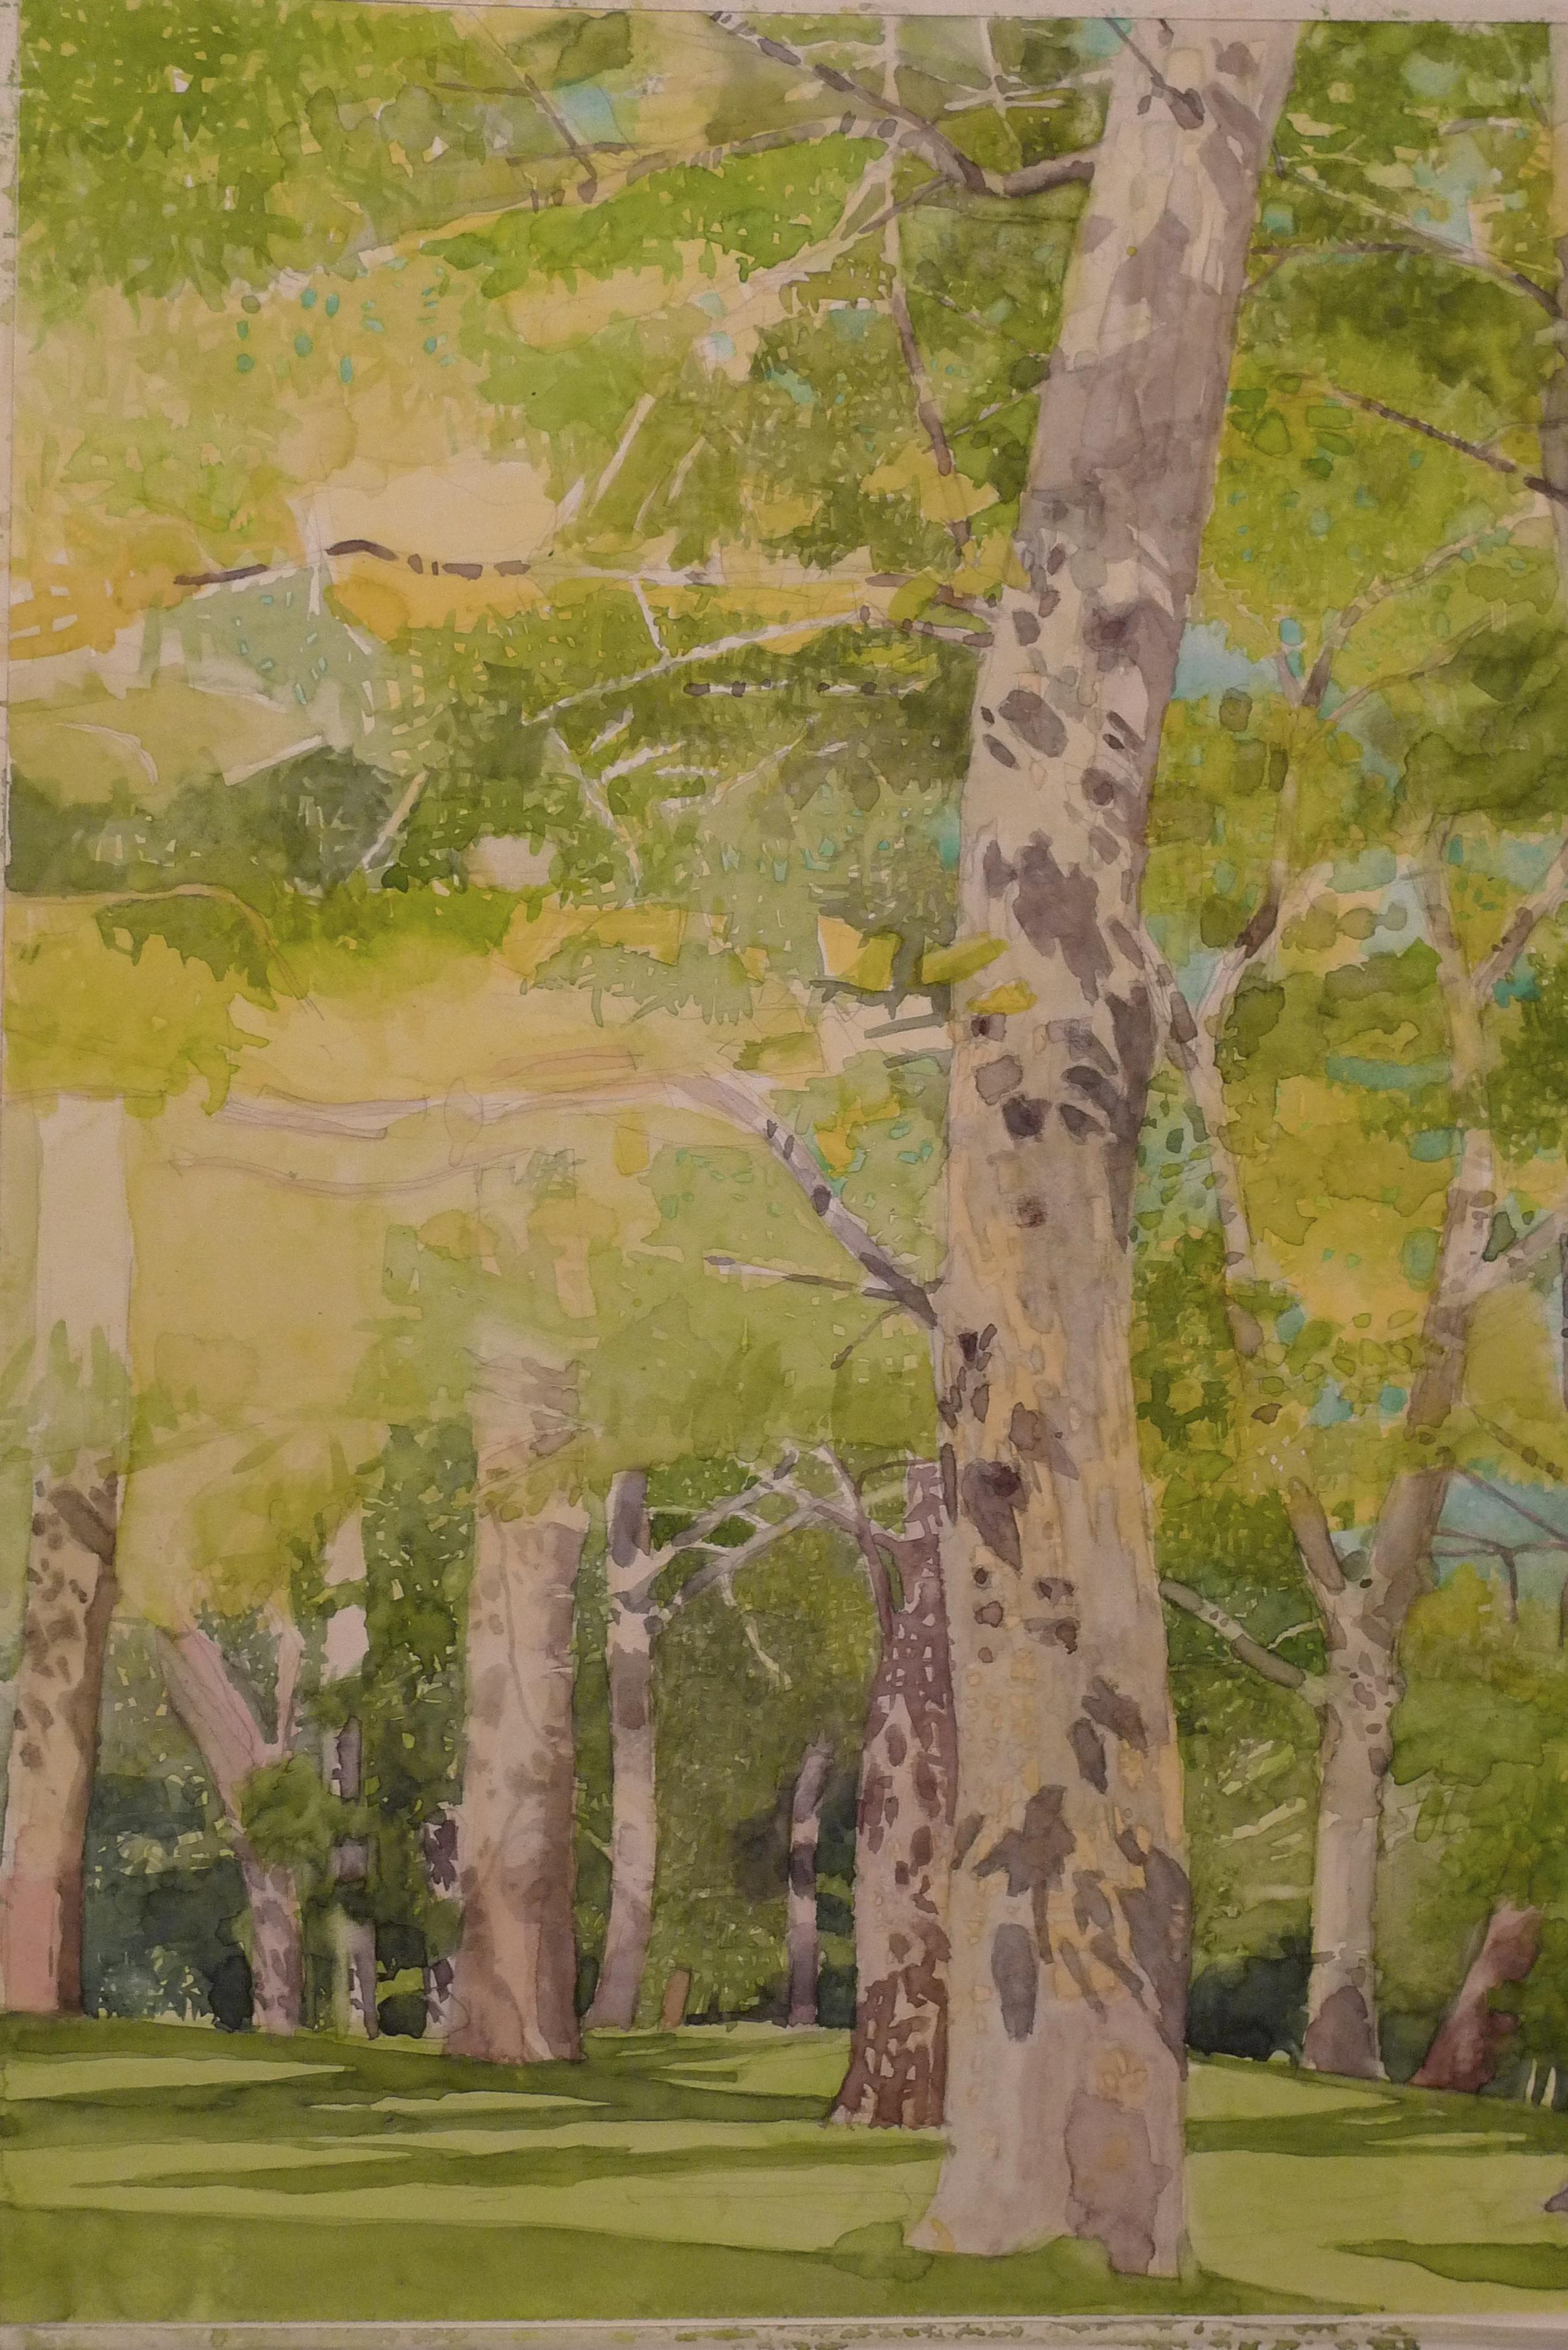 Watercolor on paper 14 x 17 inches Tarek Ashkar,2011